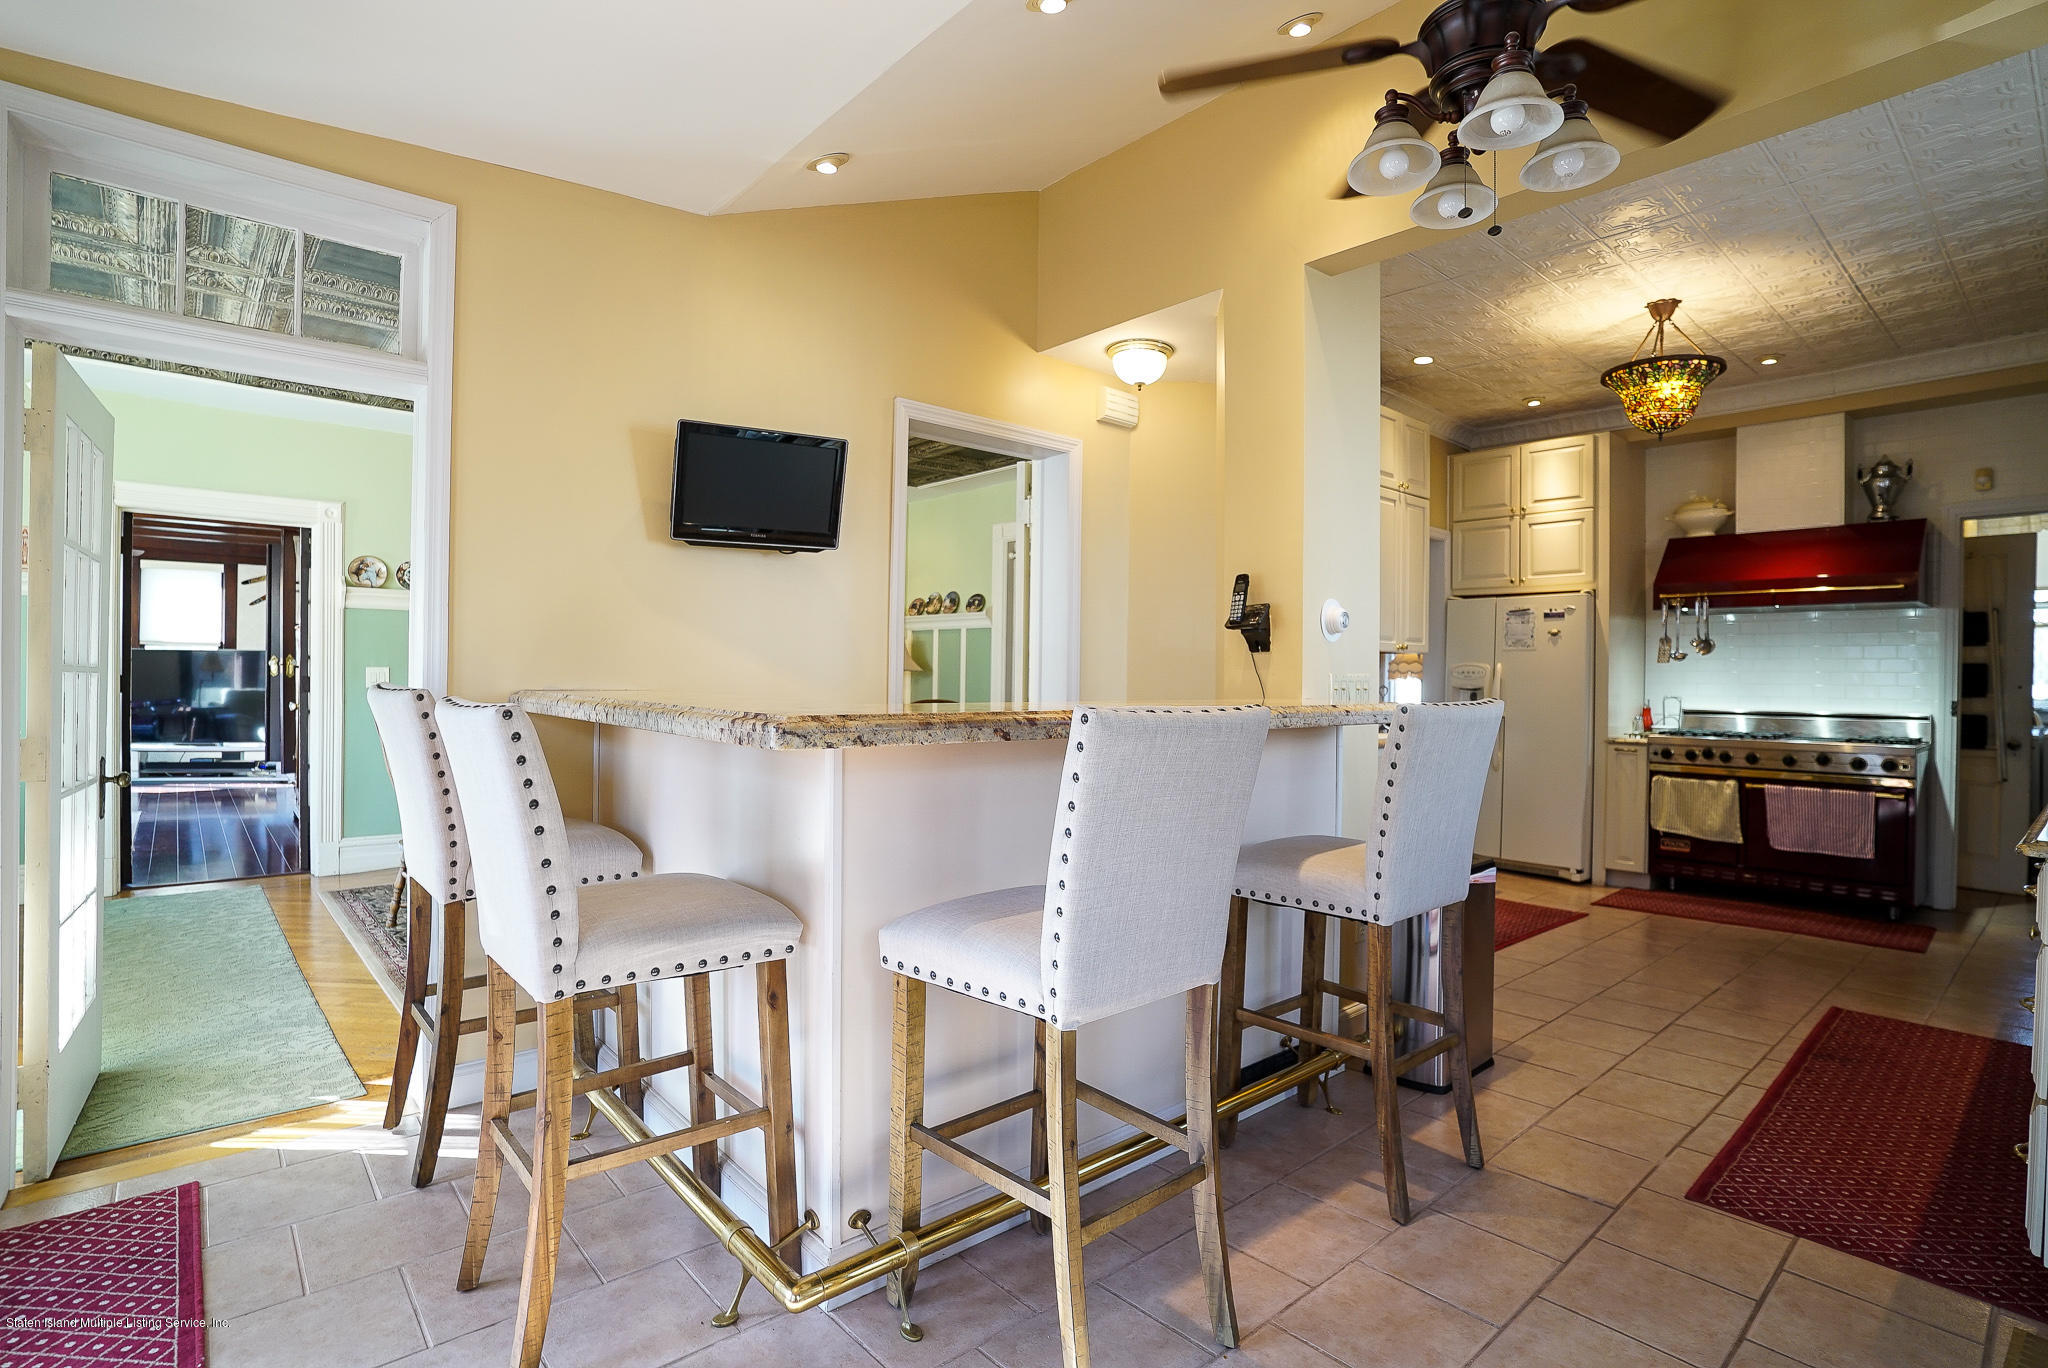 Single Family - Detached 309 Guyon Avenue  Staten Island, NY 10306, MLS-1142302-5